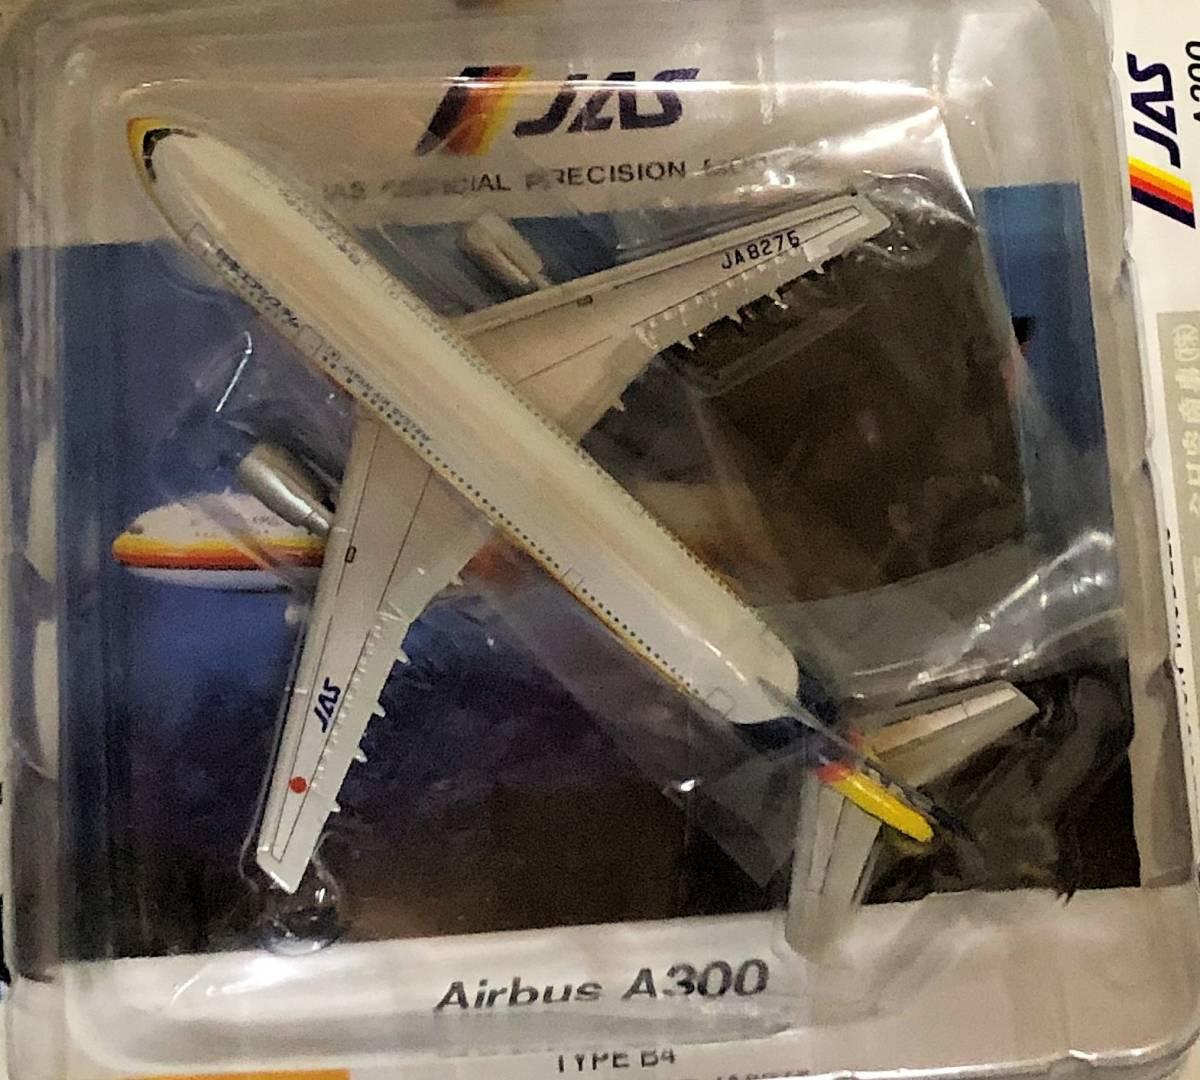 1/400 JAS OFFICIAL PRECISON(HOGAN) JAS(日本エアシステム) Japan Air System A300B4-2C_画像5